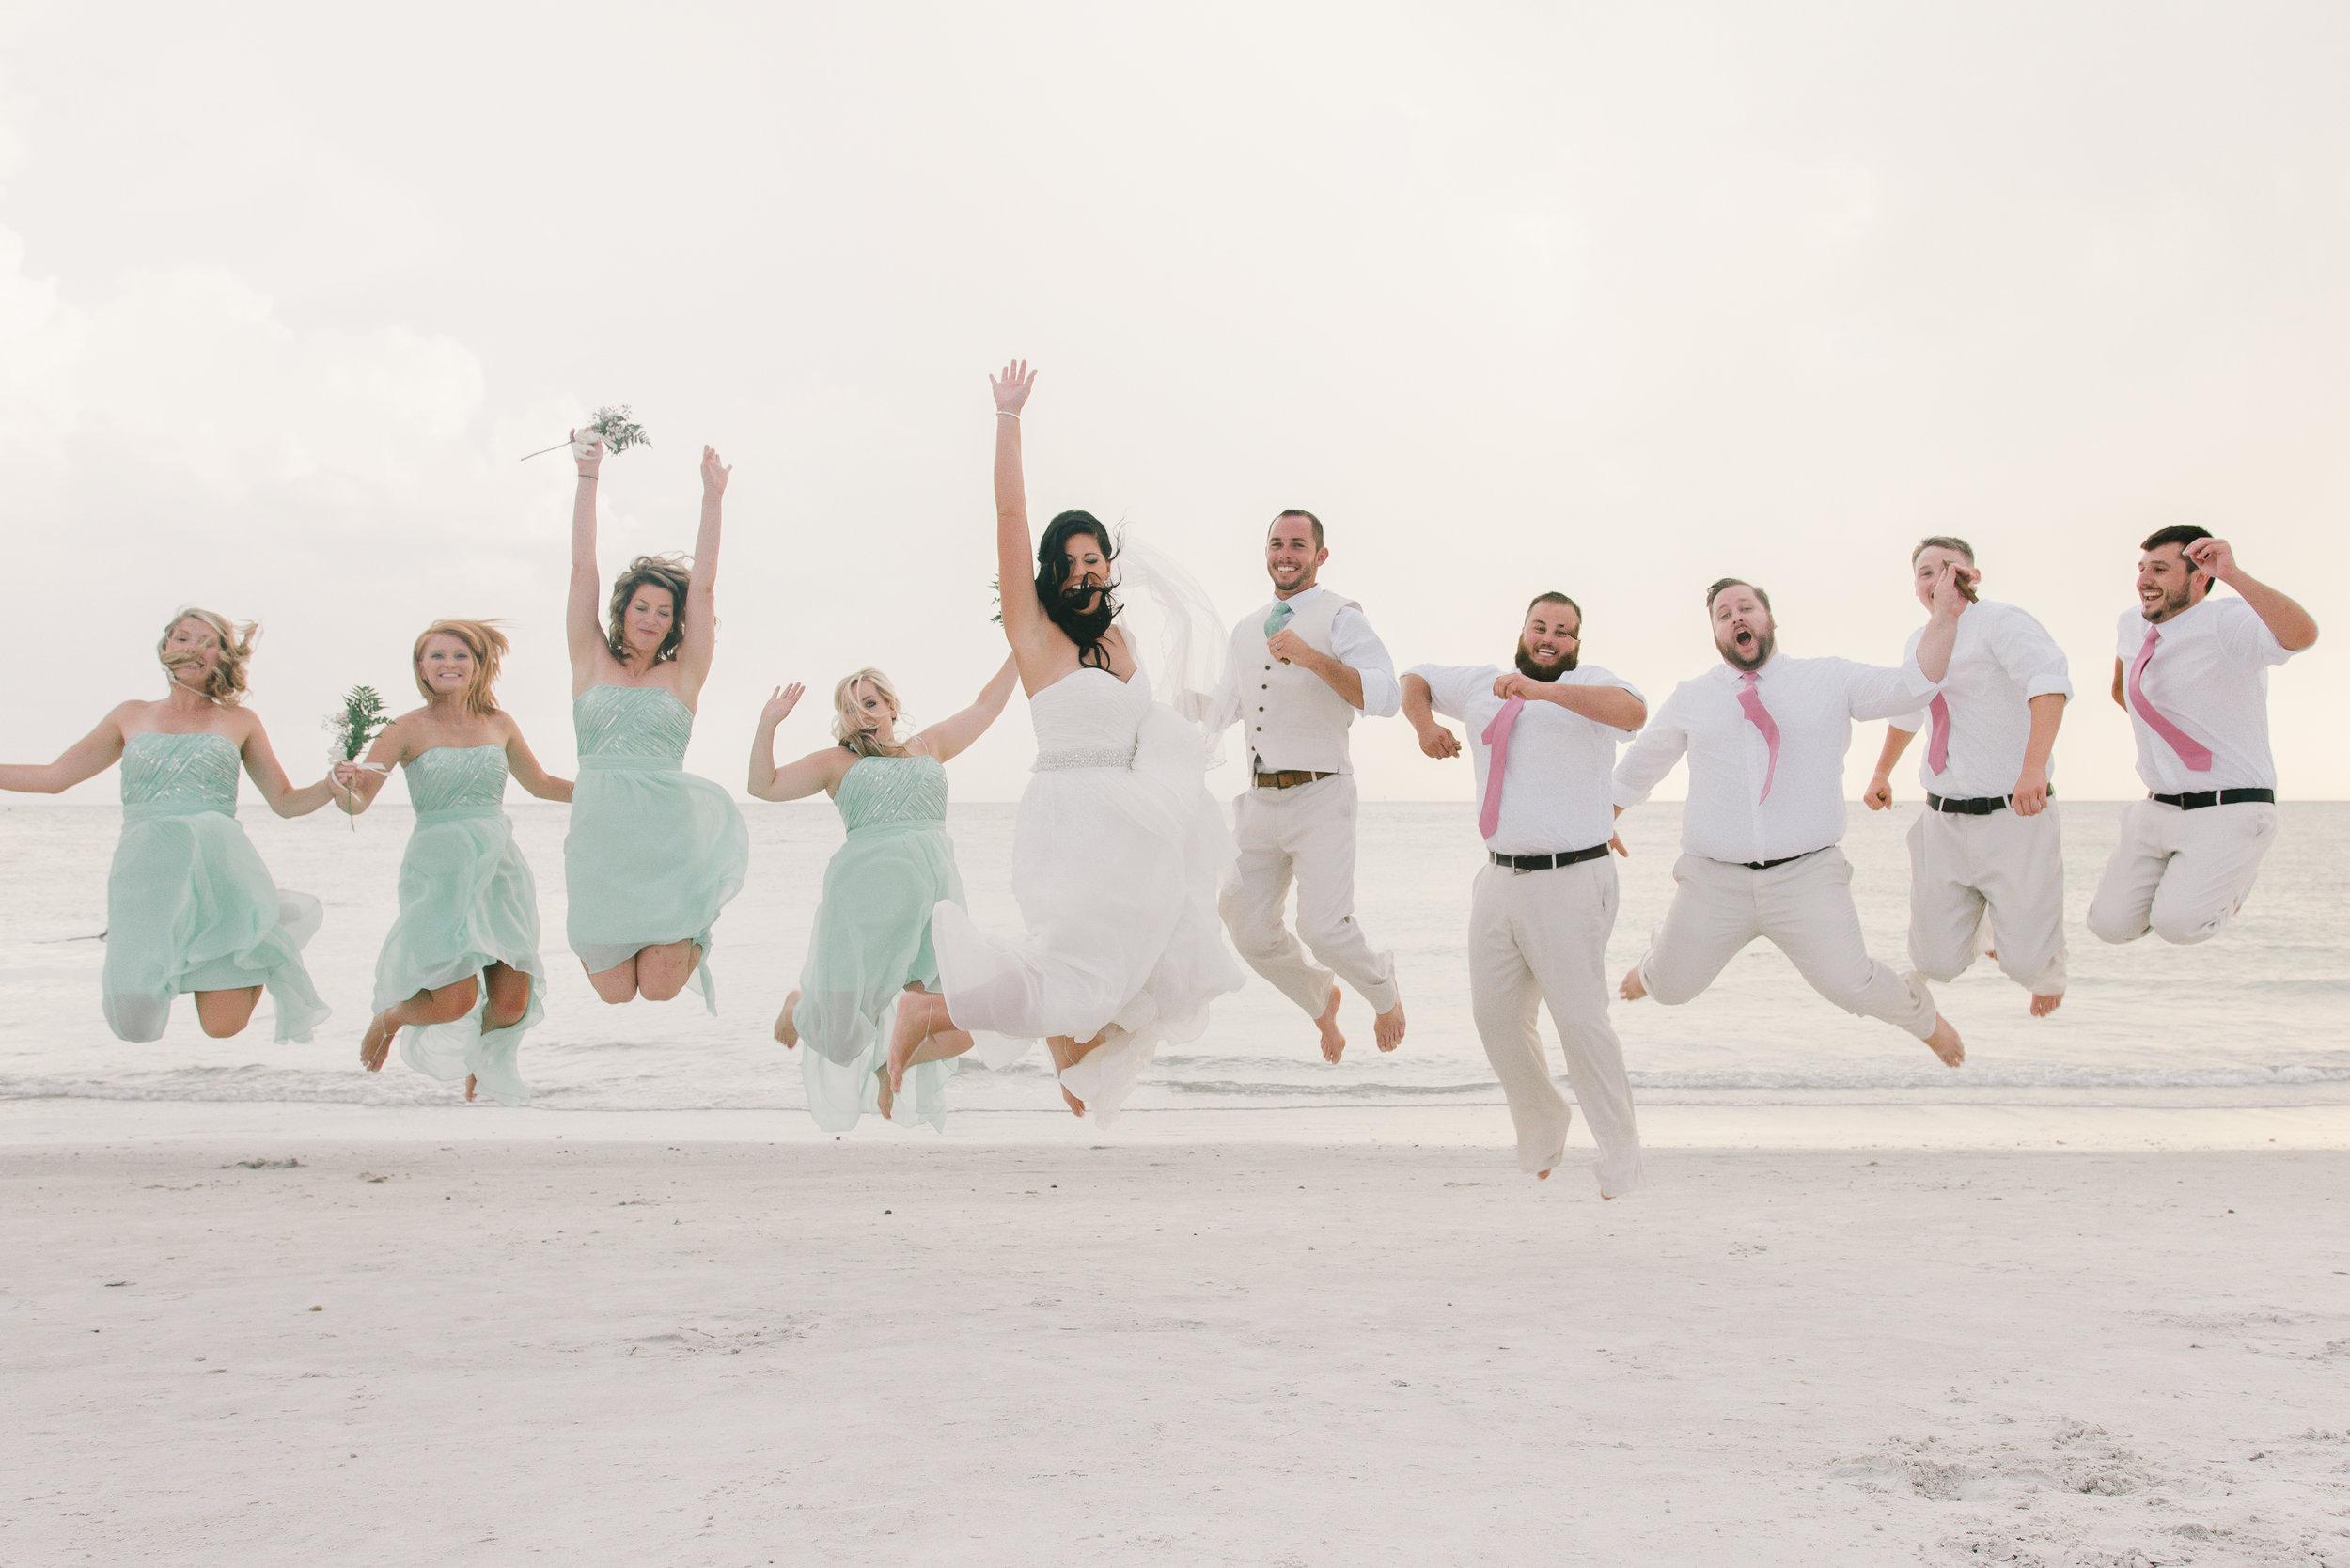 St.Pete wedding photographer, Tampa wedding photographer, Tide the knot beach weddings, St.Pete wedding, Beach wedding, beach wedding photographer, Mir Salgado Photography